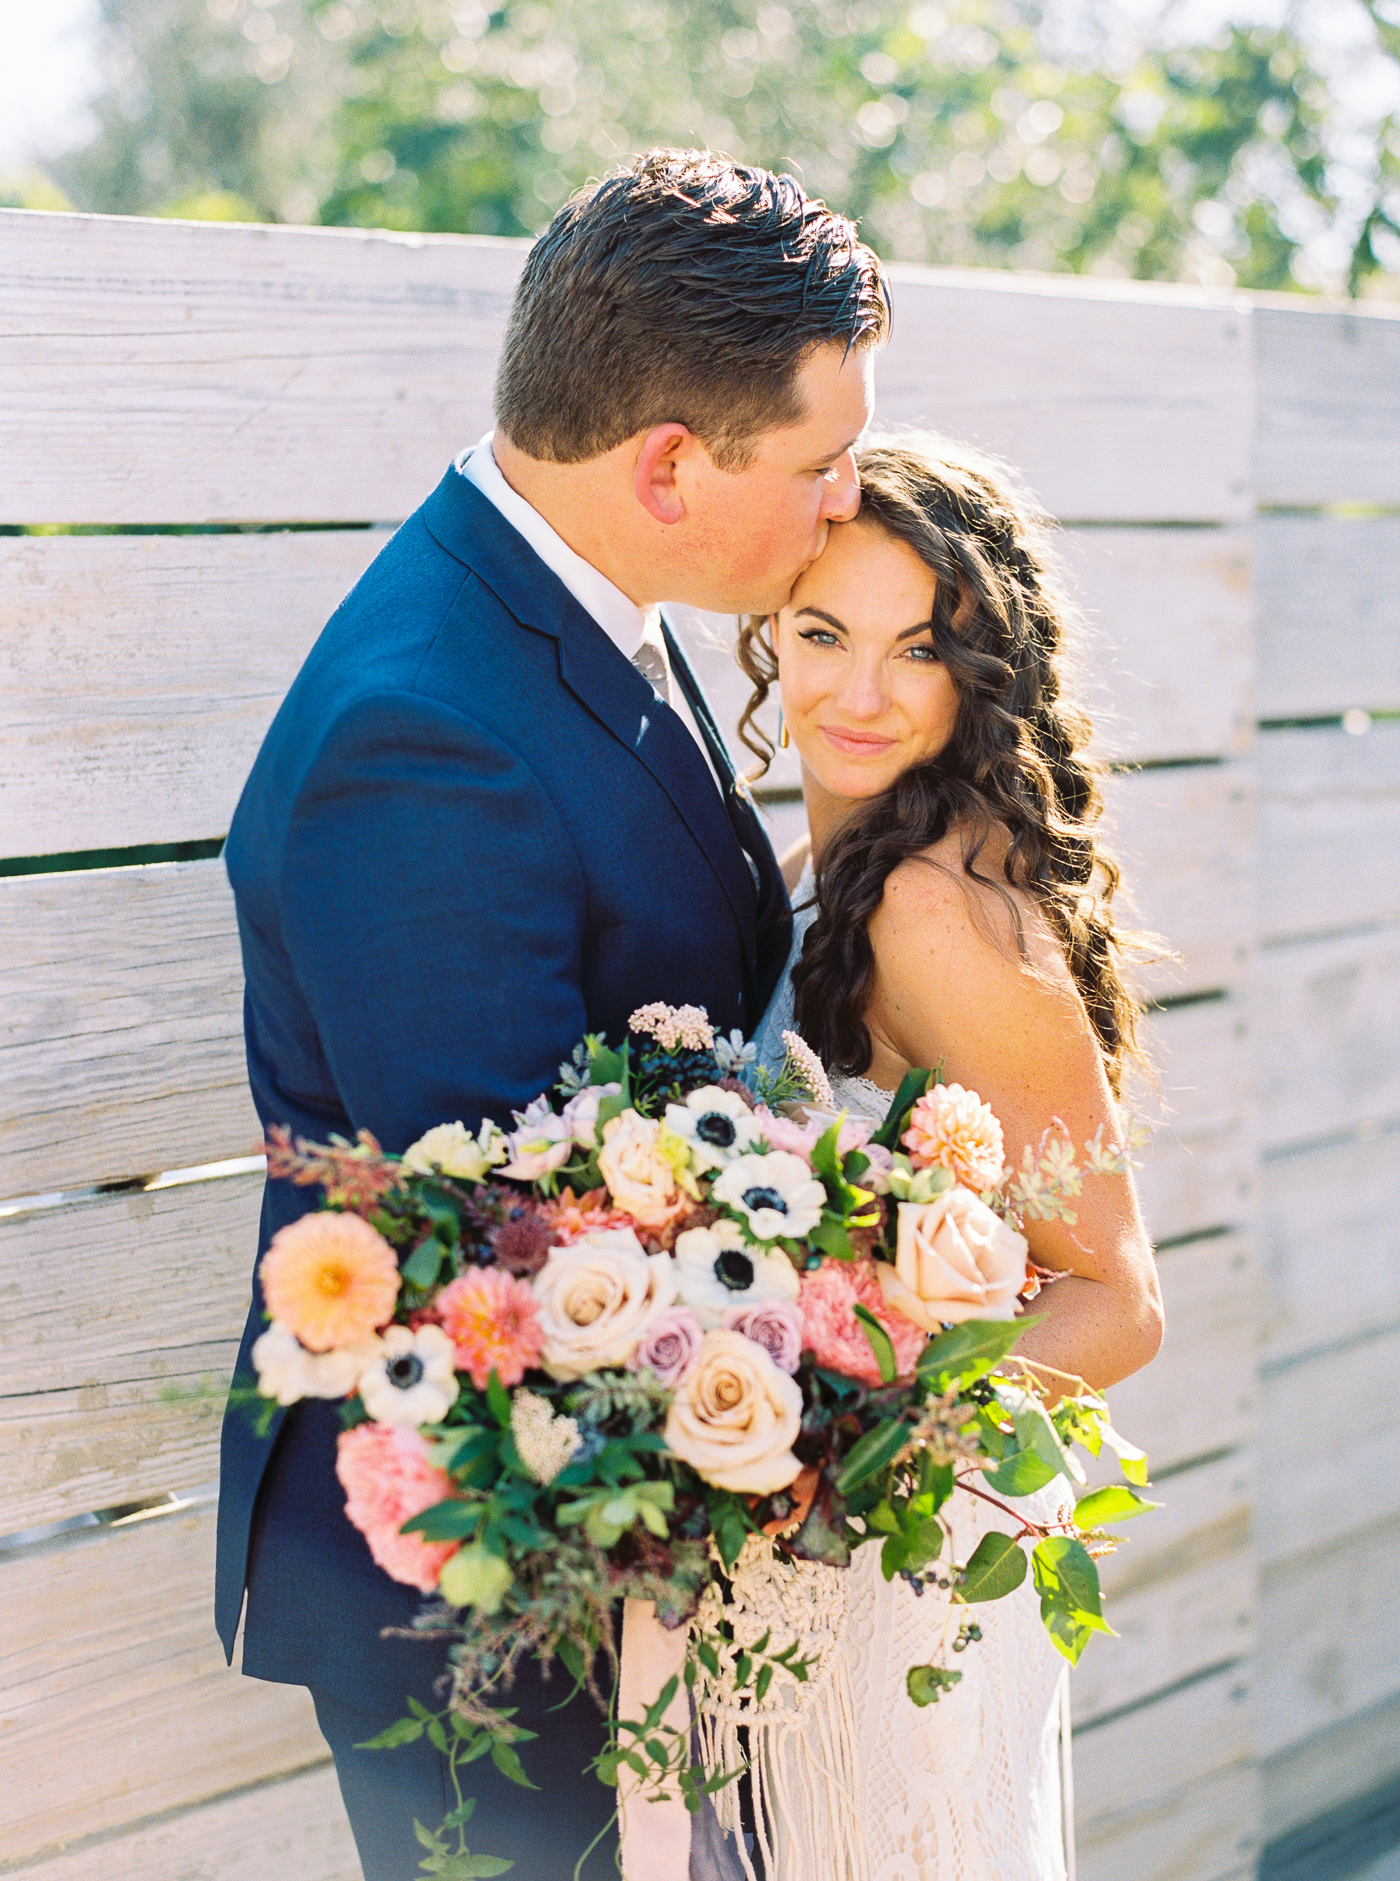 Biddle Ranch wedding-43.jpg